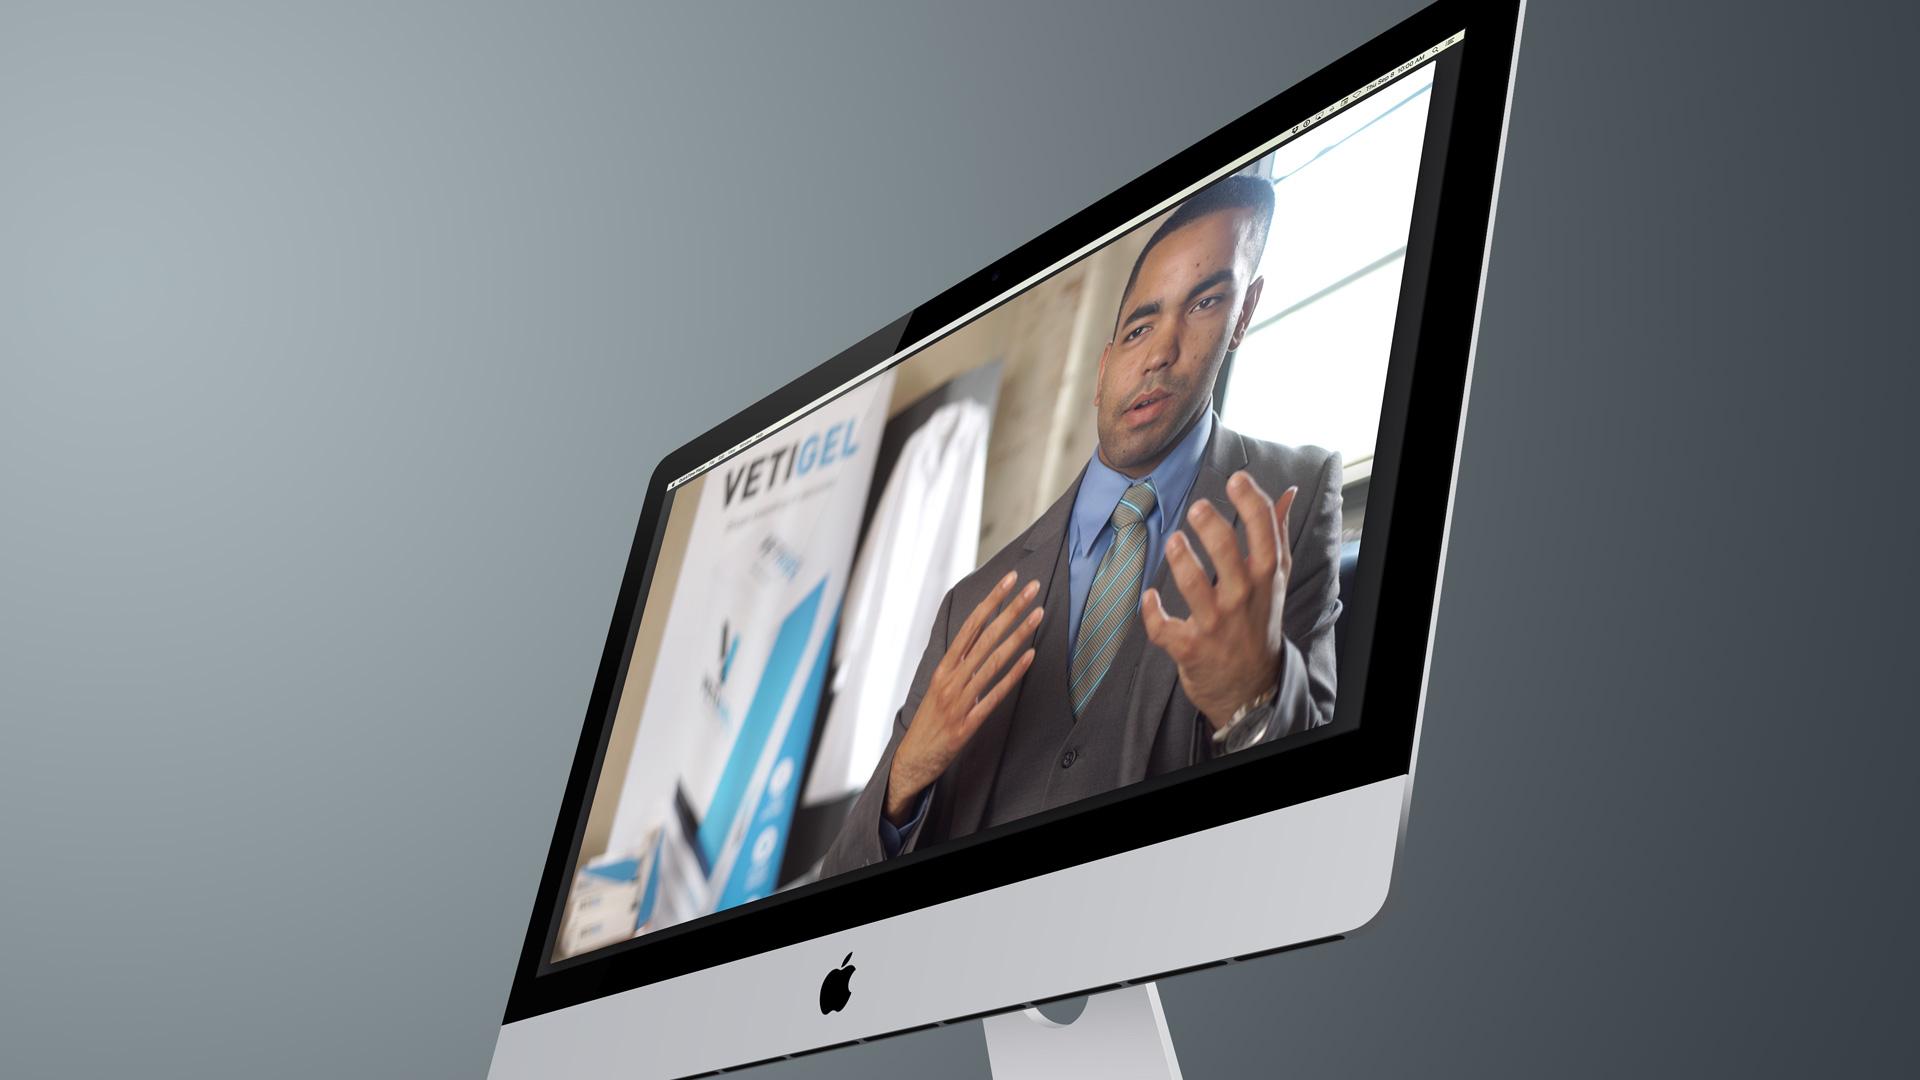 iMac-Pres-crsln-fin-01.jpg